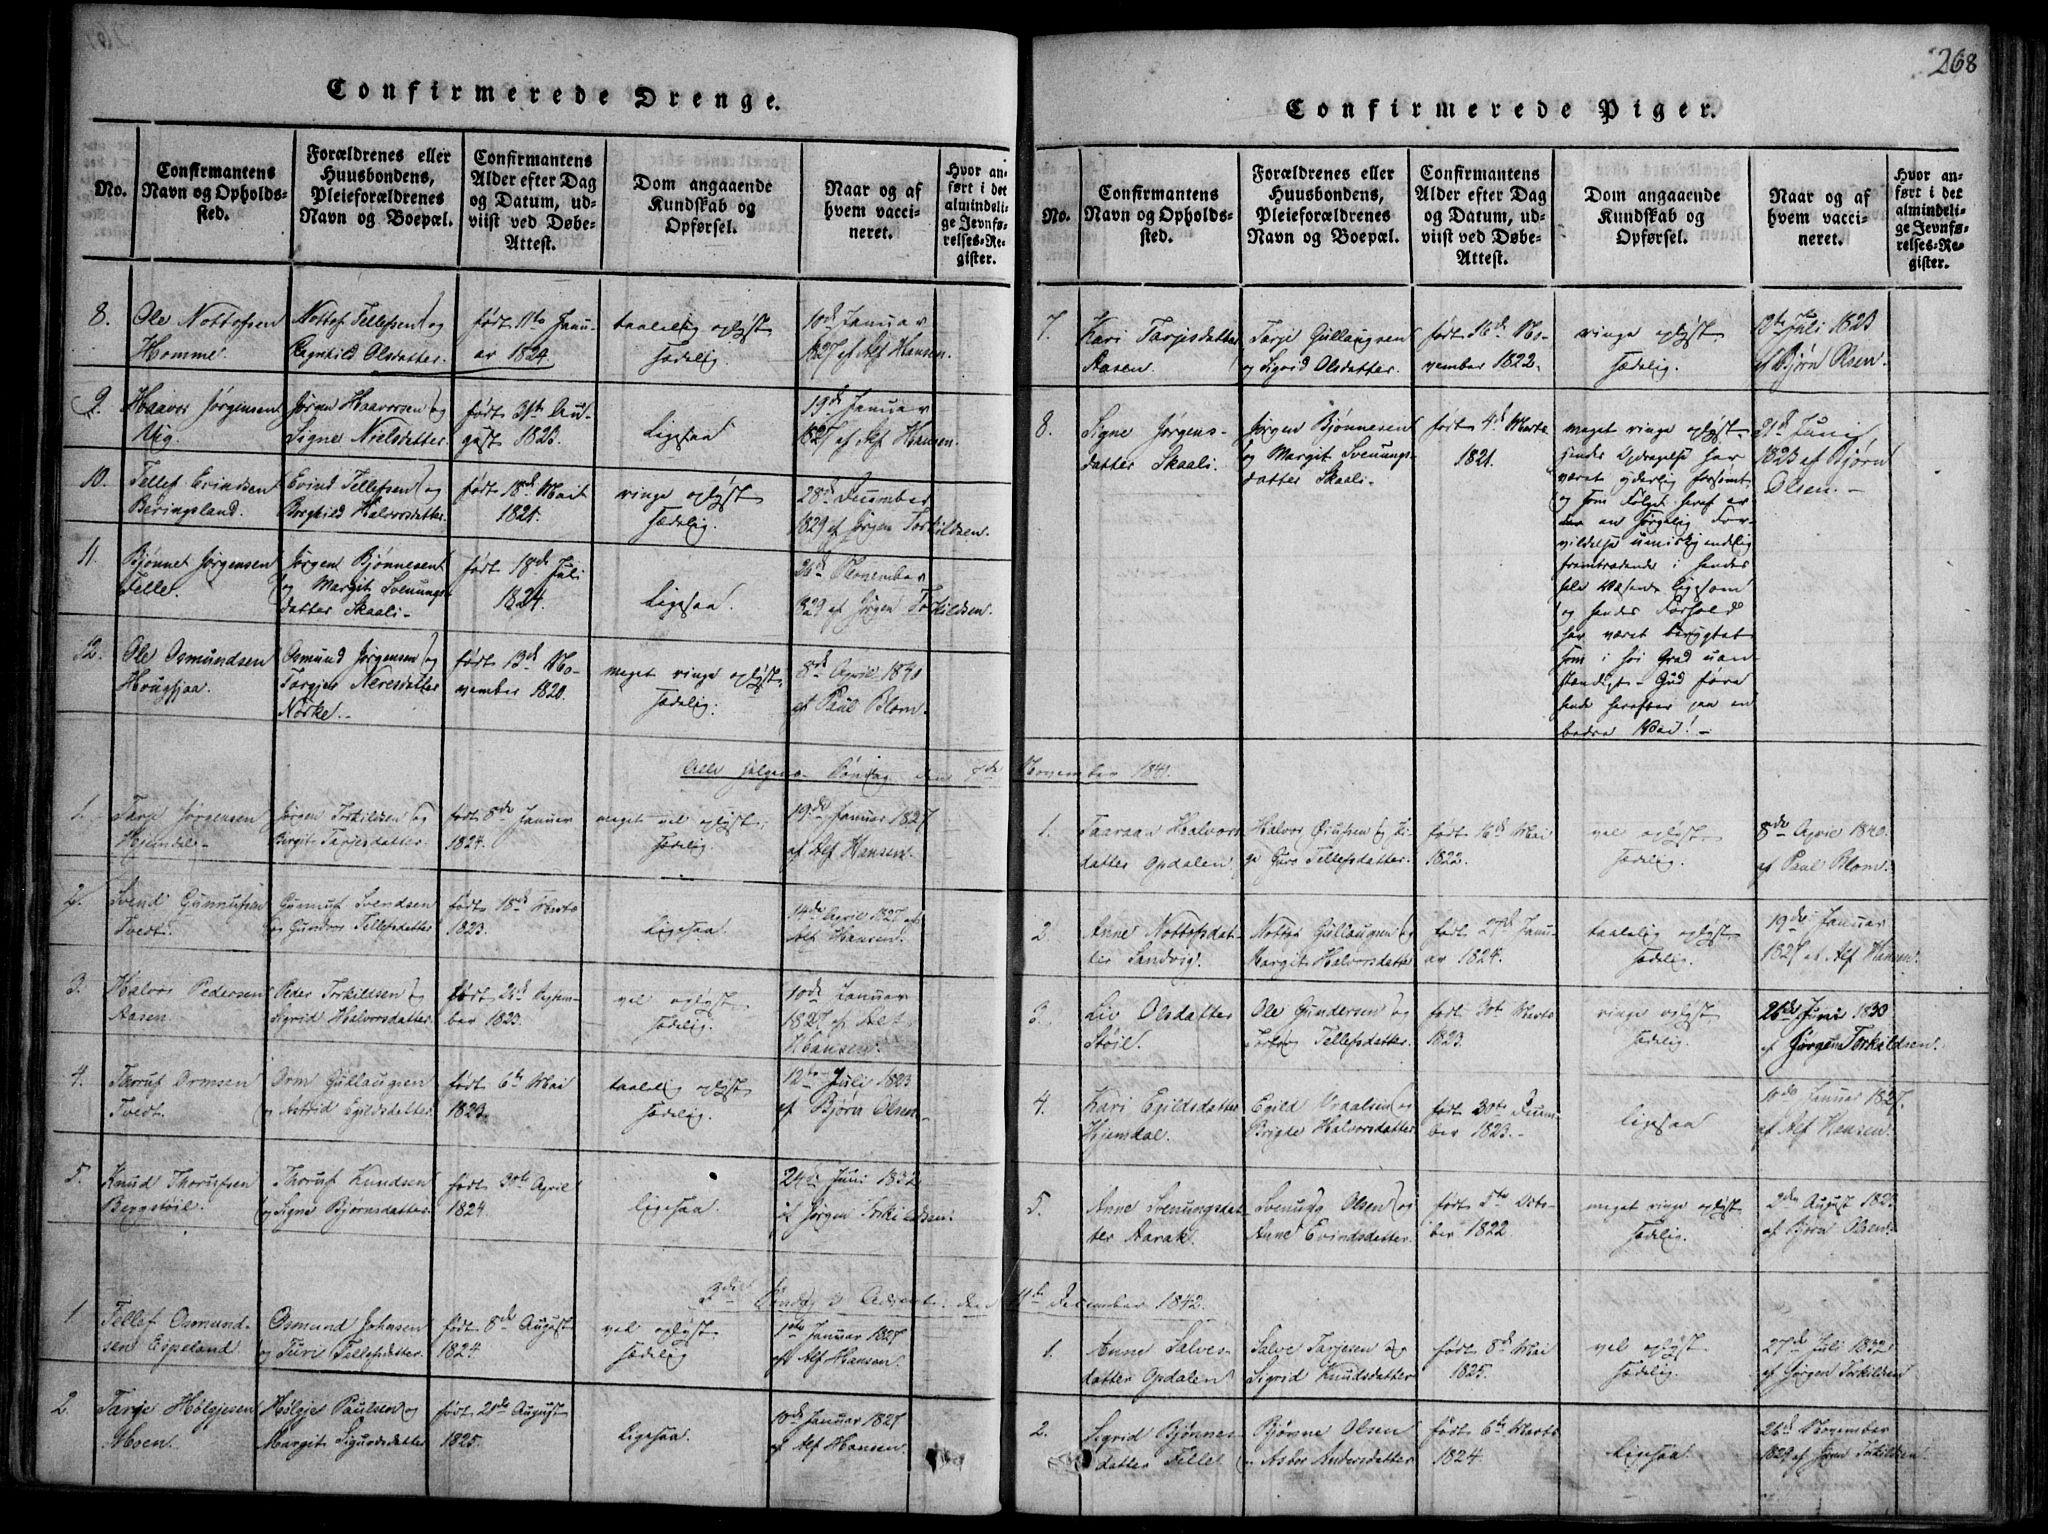 SAKO, Nissedal kirkebøker, F/Fb/L0001: Ministerialbok nr. II 1, 1814-1845, s. 268